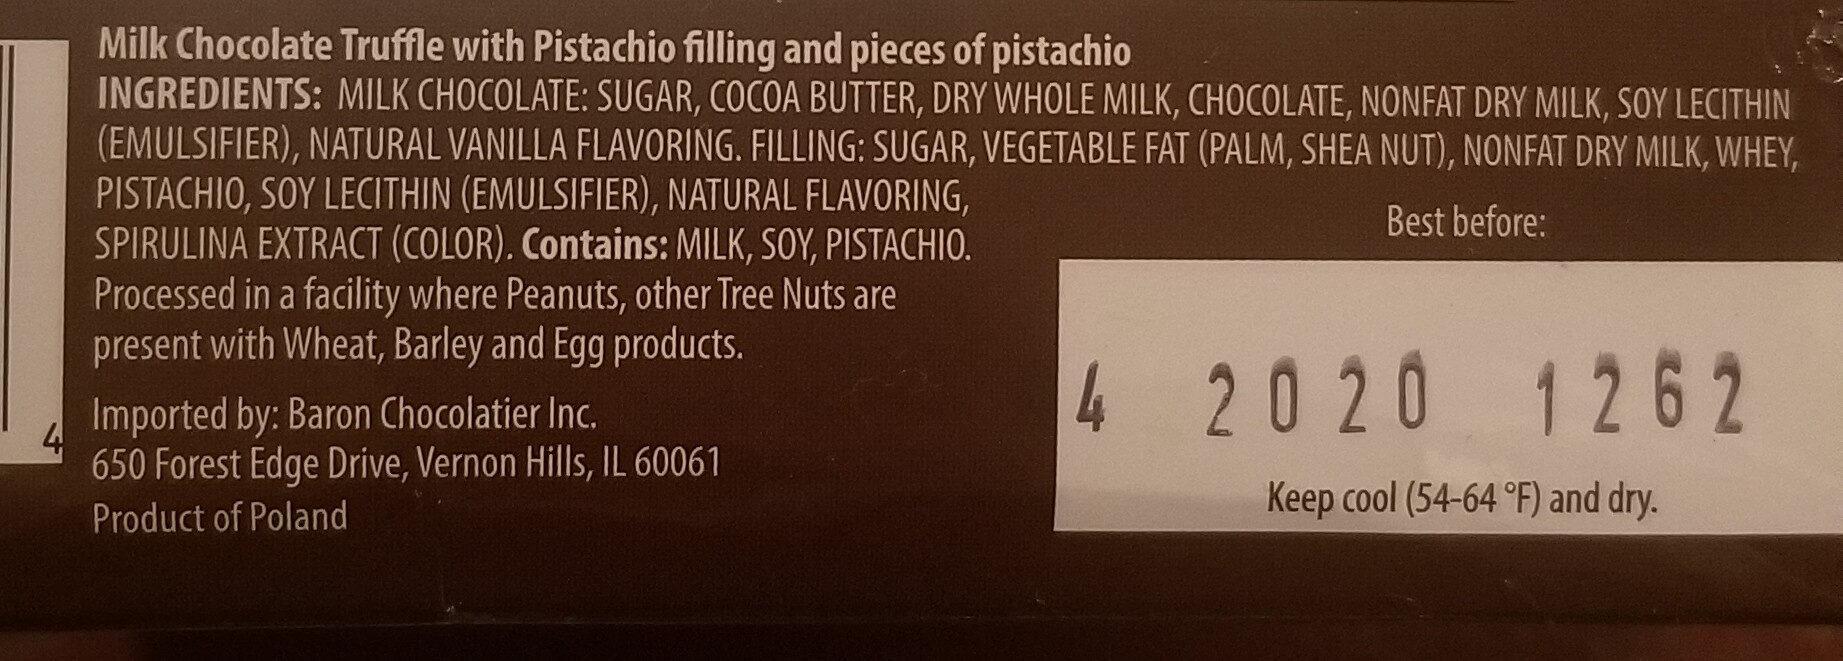 Premium Milk Chocolate Truffles Pistachio - Ingredients - en